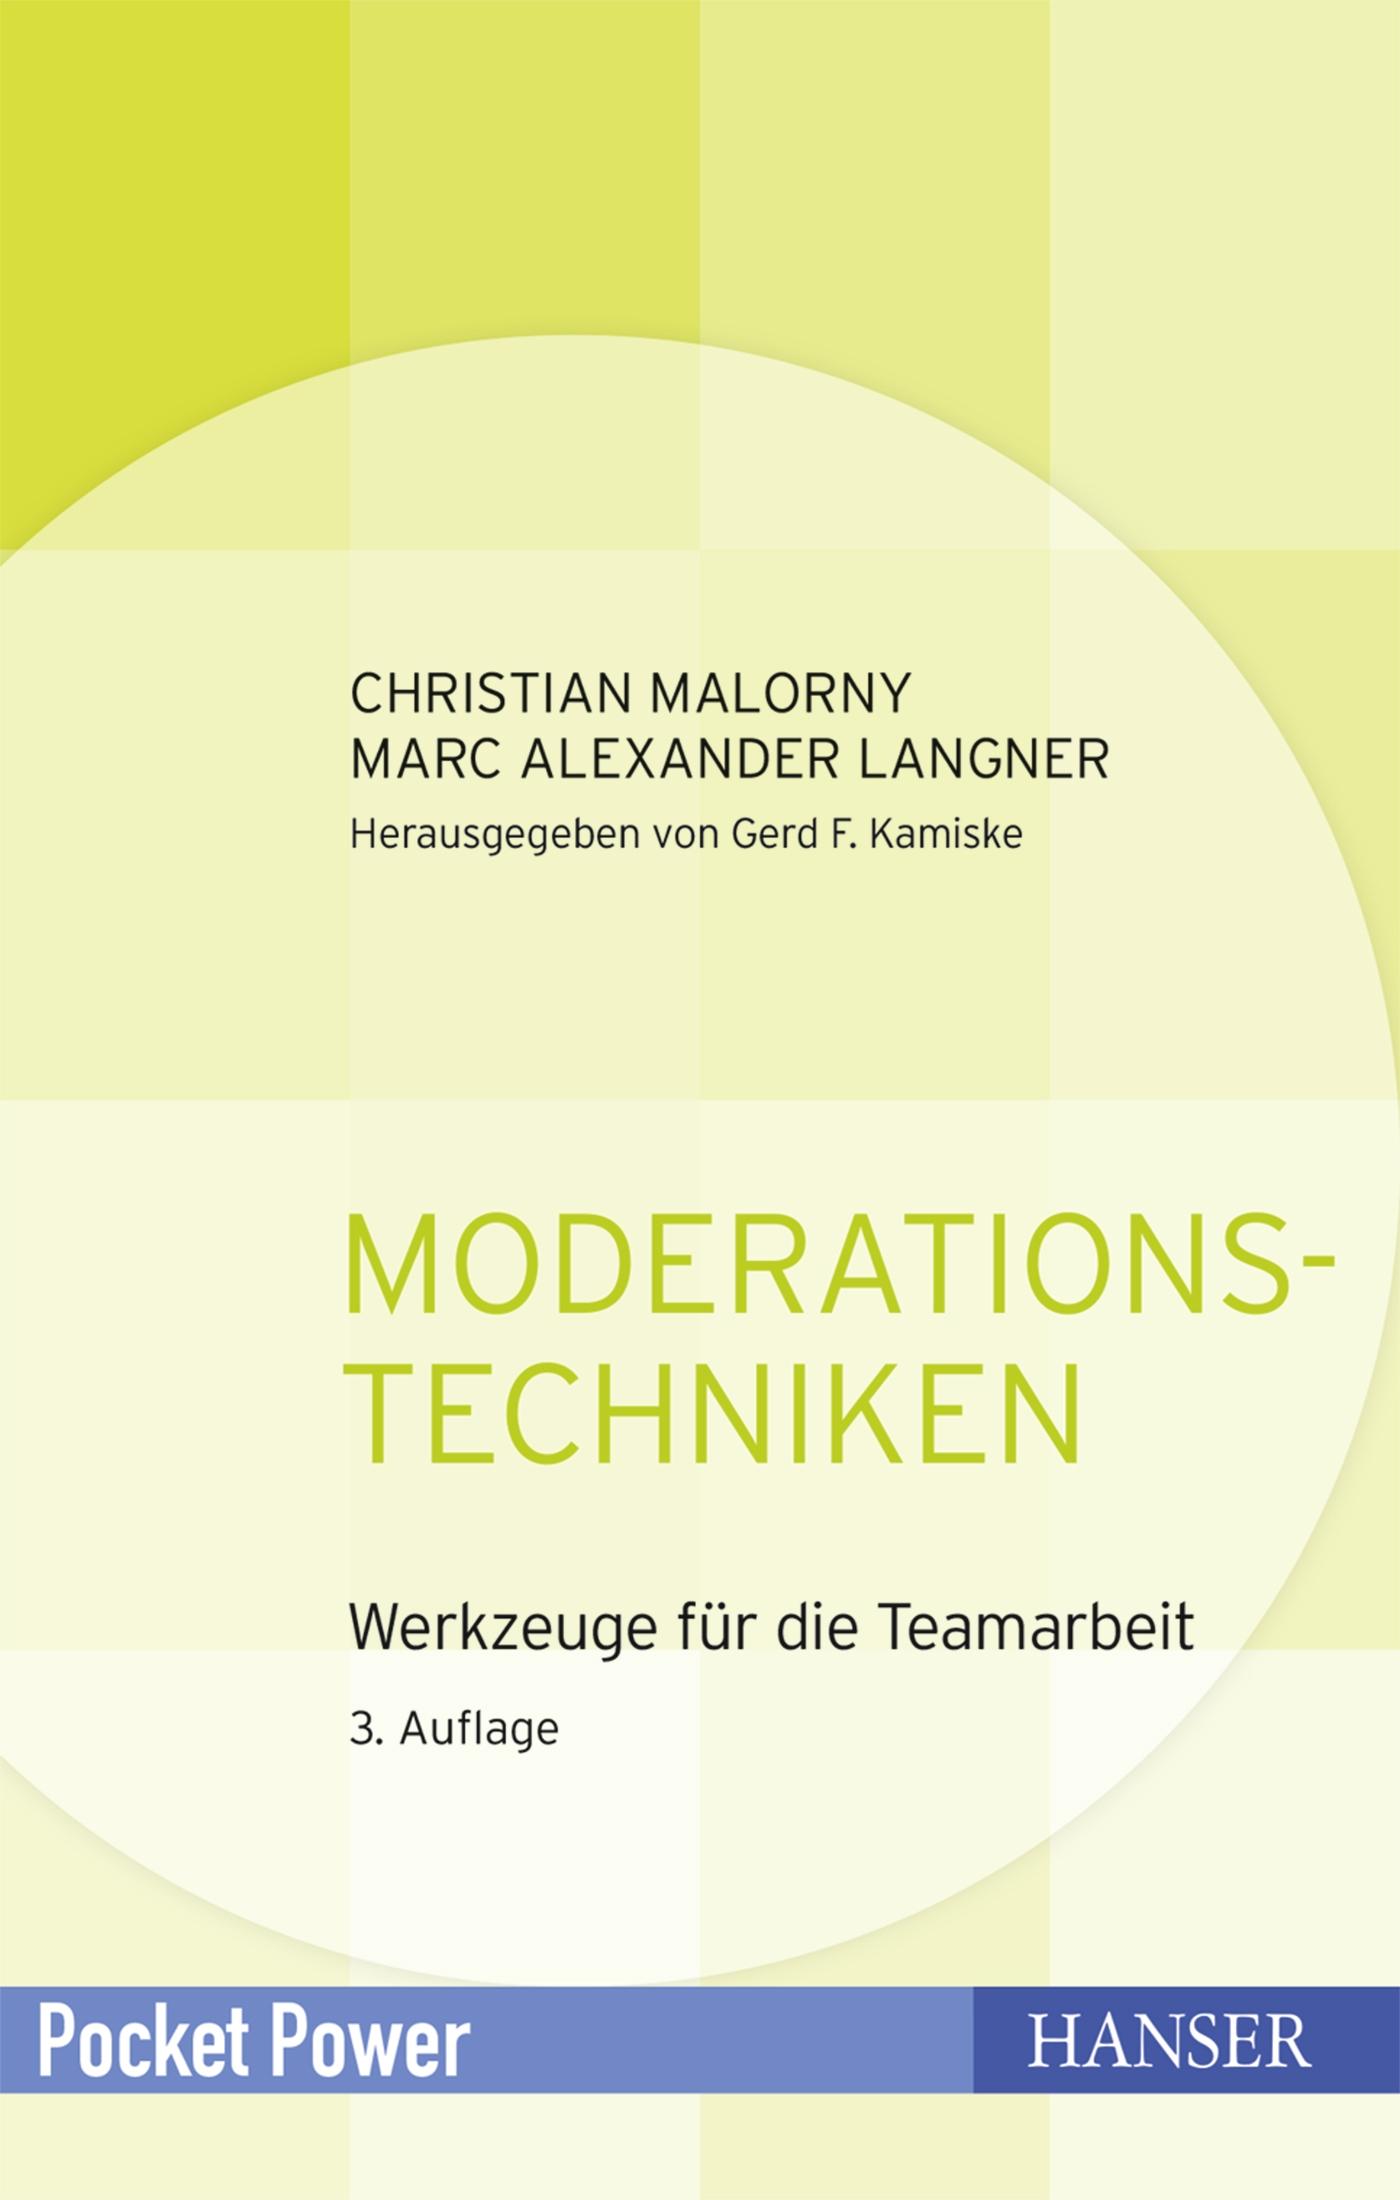 Moderationsplan